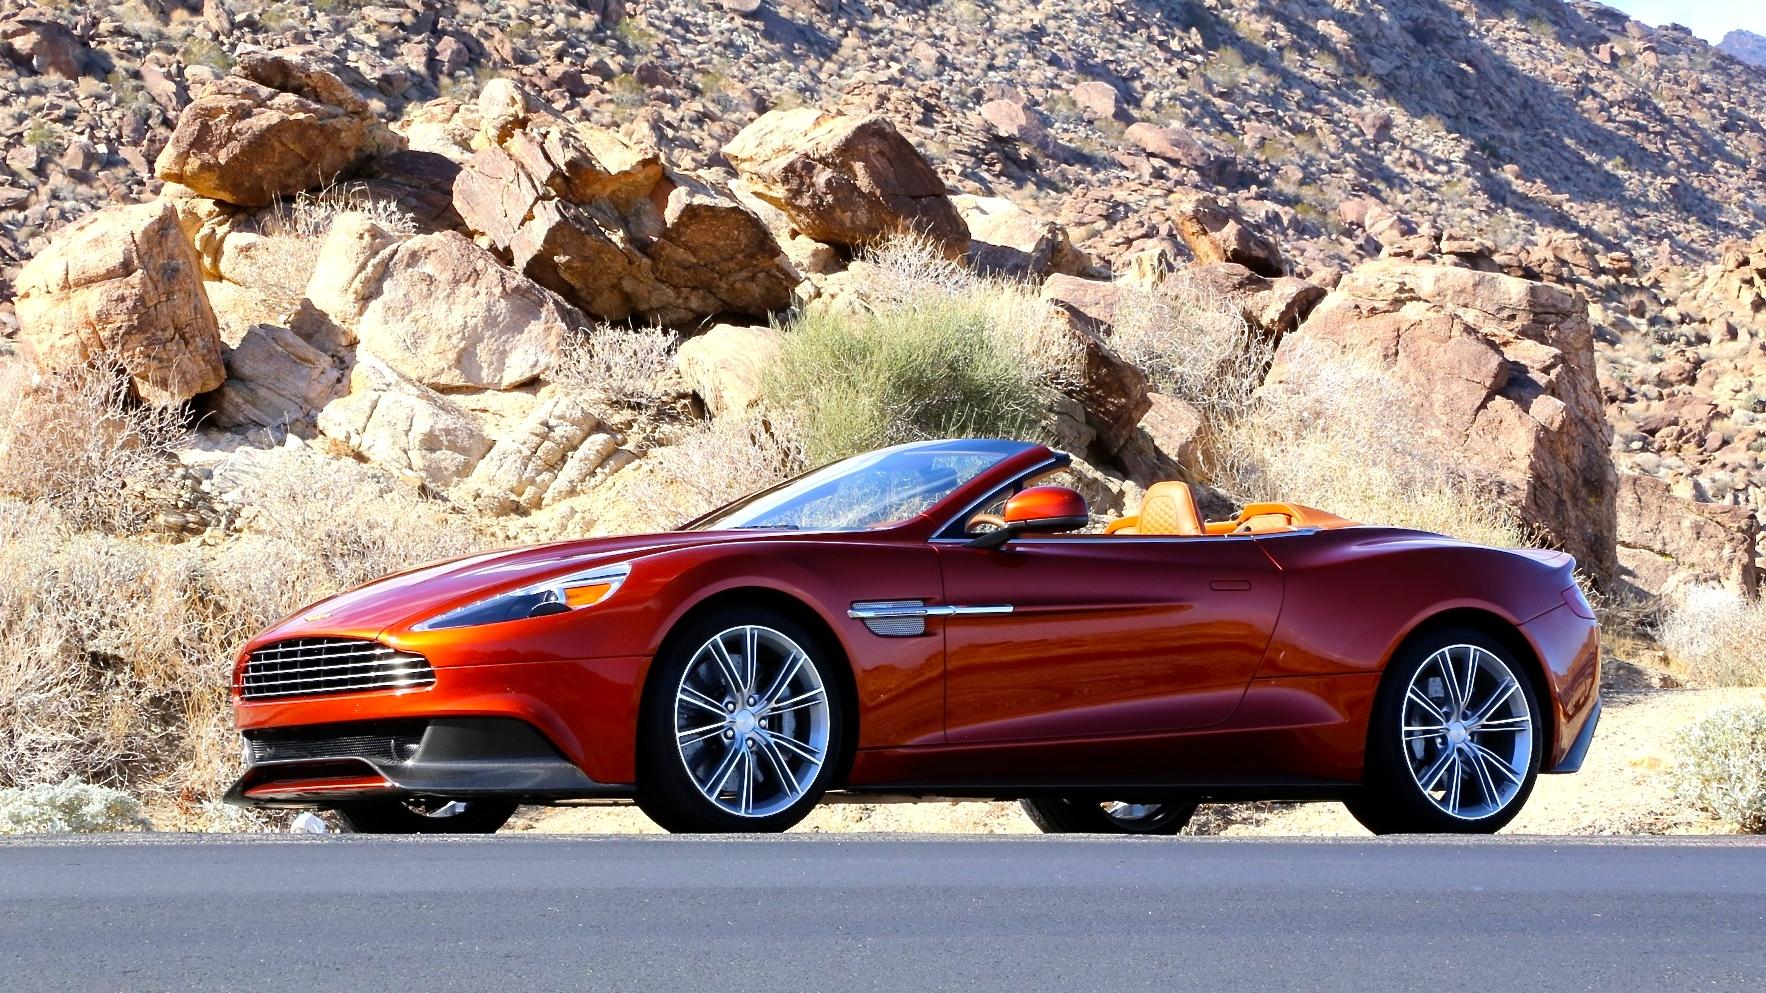 2014 Aston Martin Vanquish Volante First Drive Review